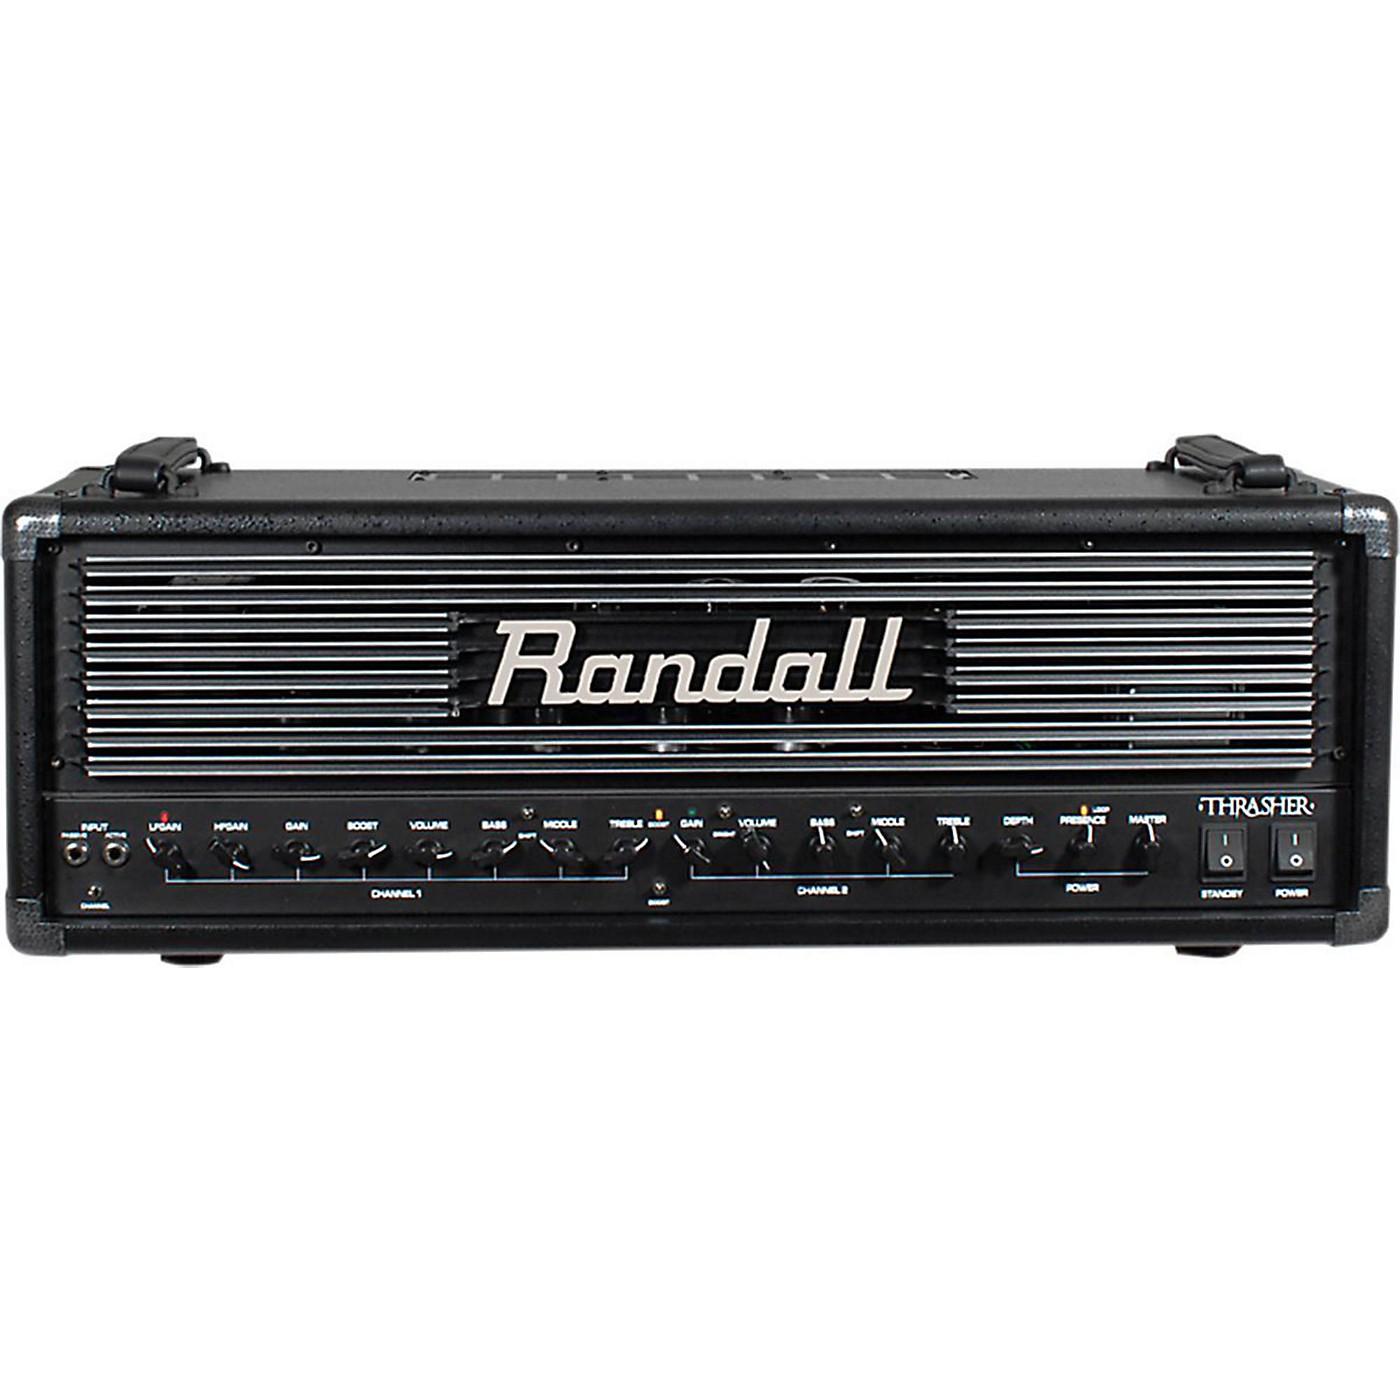 Randall Thrasher 120W 4-Mode All-Tube Amplifier Head thumbnail